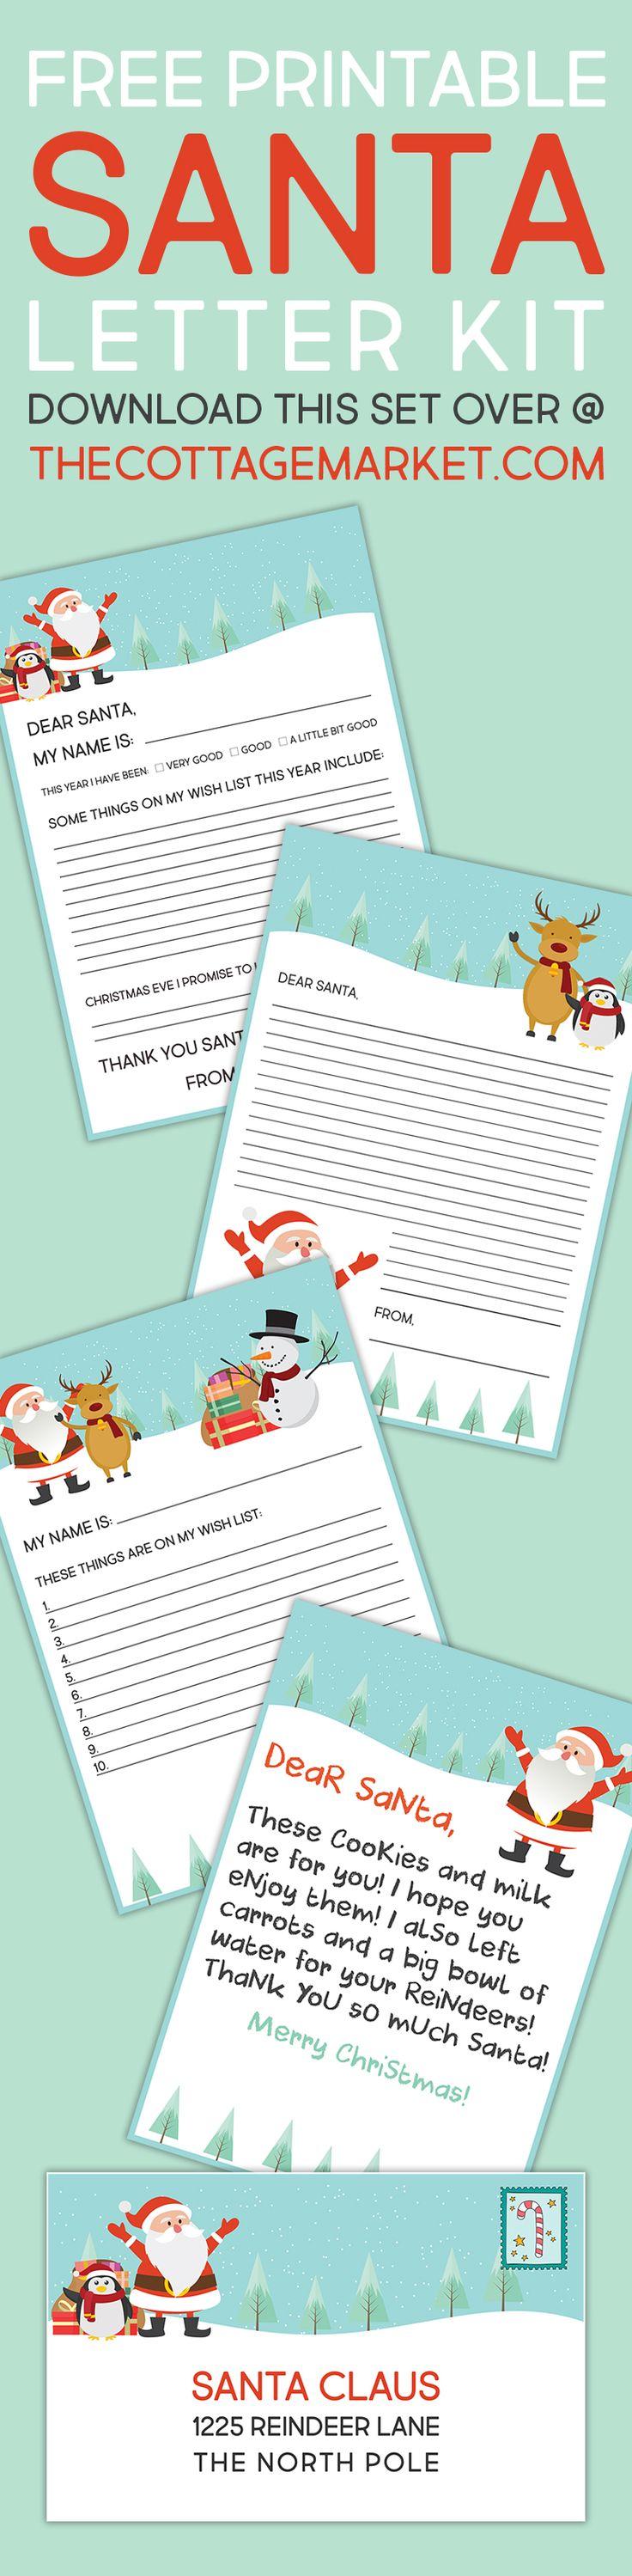 Free Printable Santa Letter Kit Free Printable Santa Letters Free